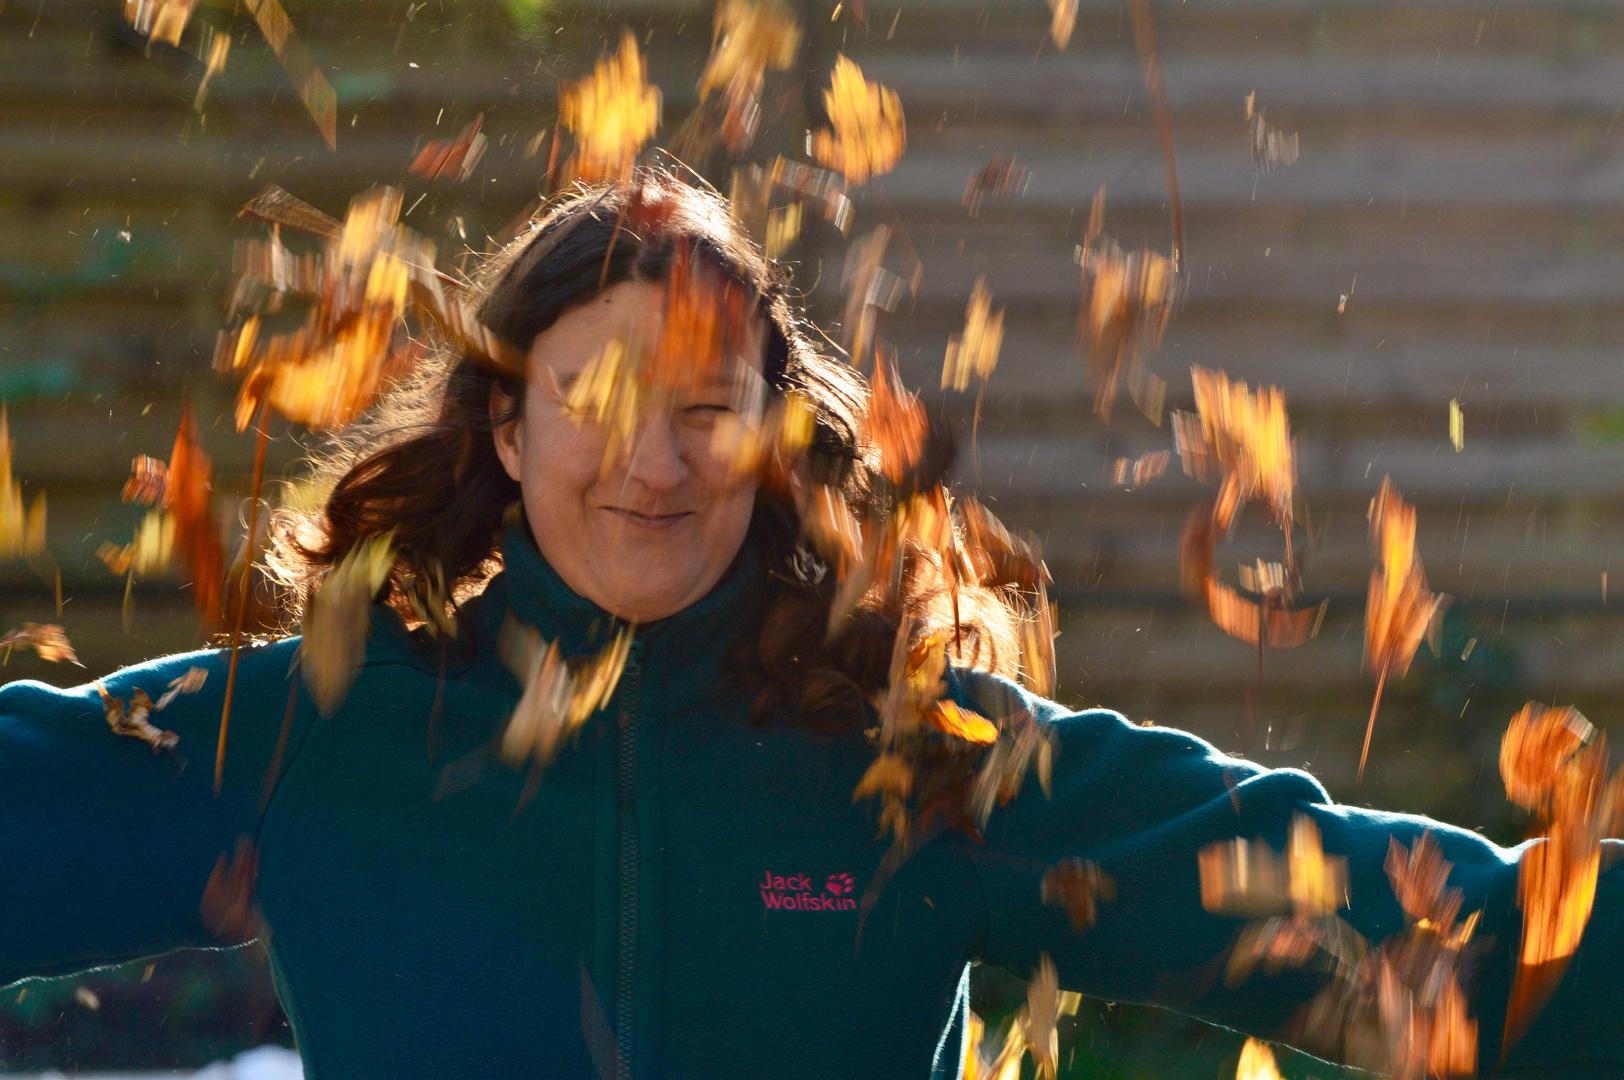 Eine Frau im Herbst.